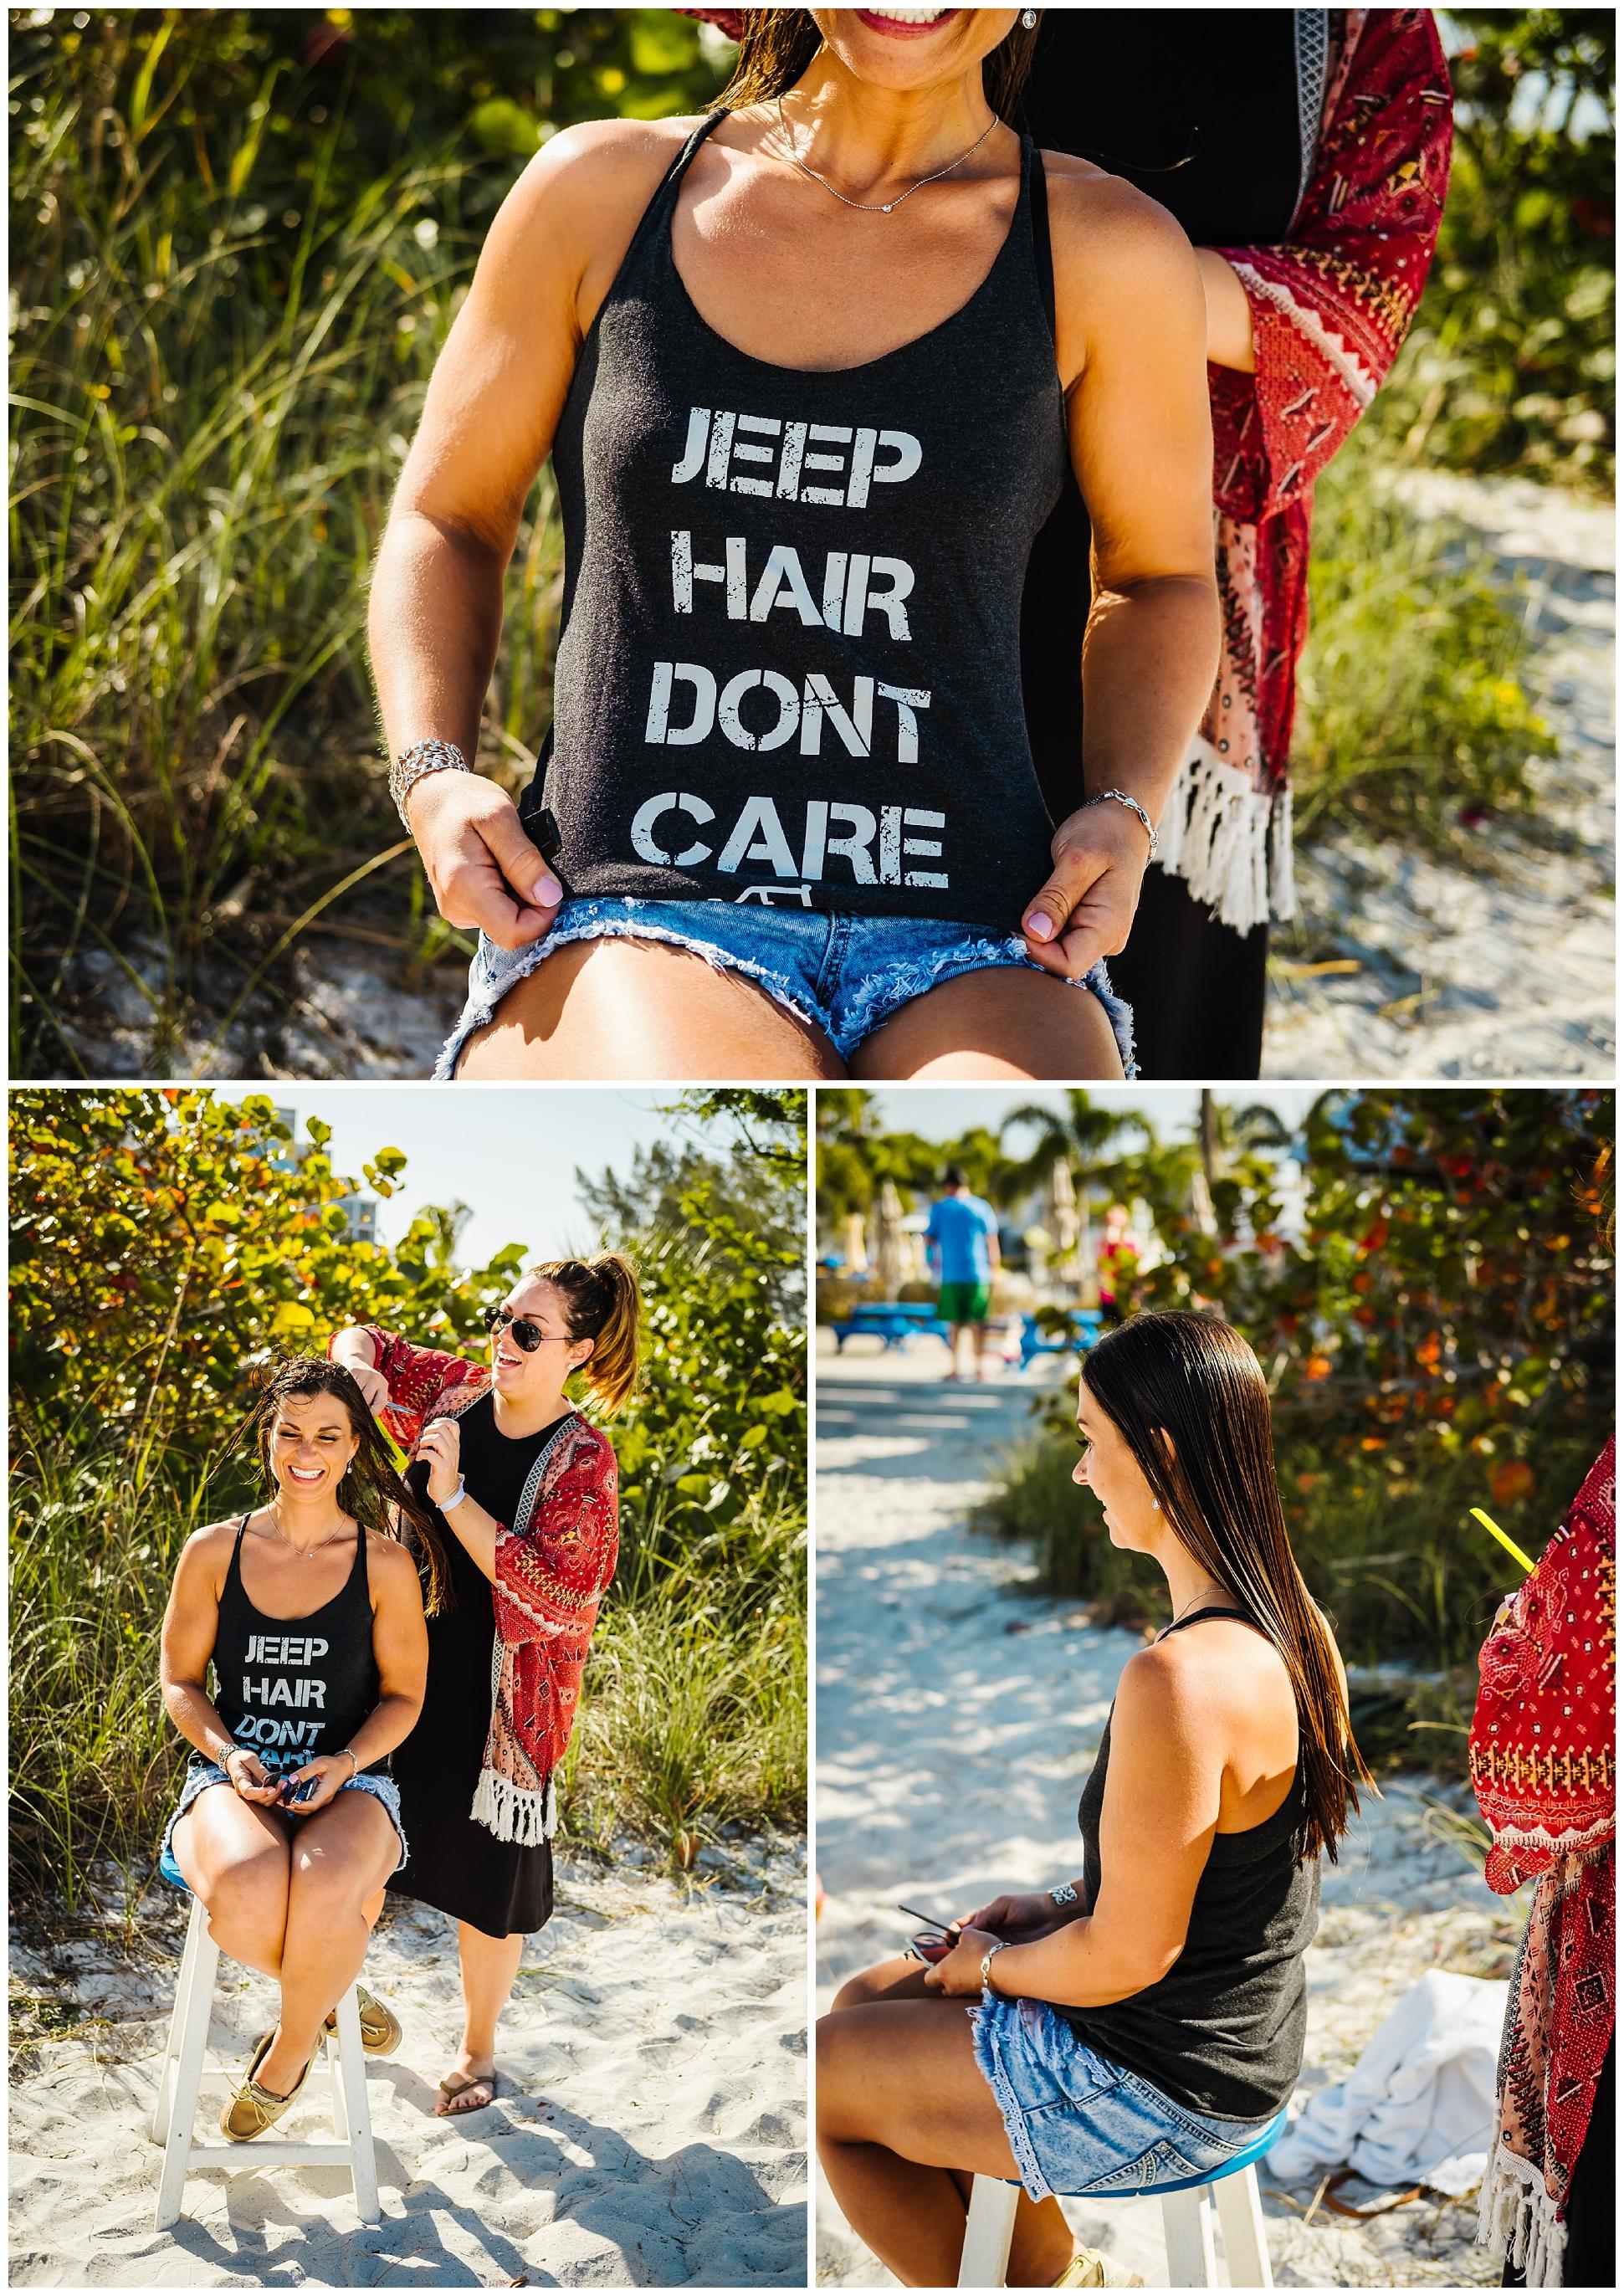 Tampa-wedding-photographer-locks-of-love-bride-hair-donation-cancer-awareness_0001.jpg